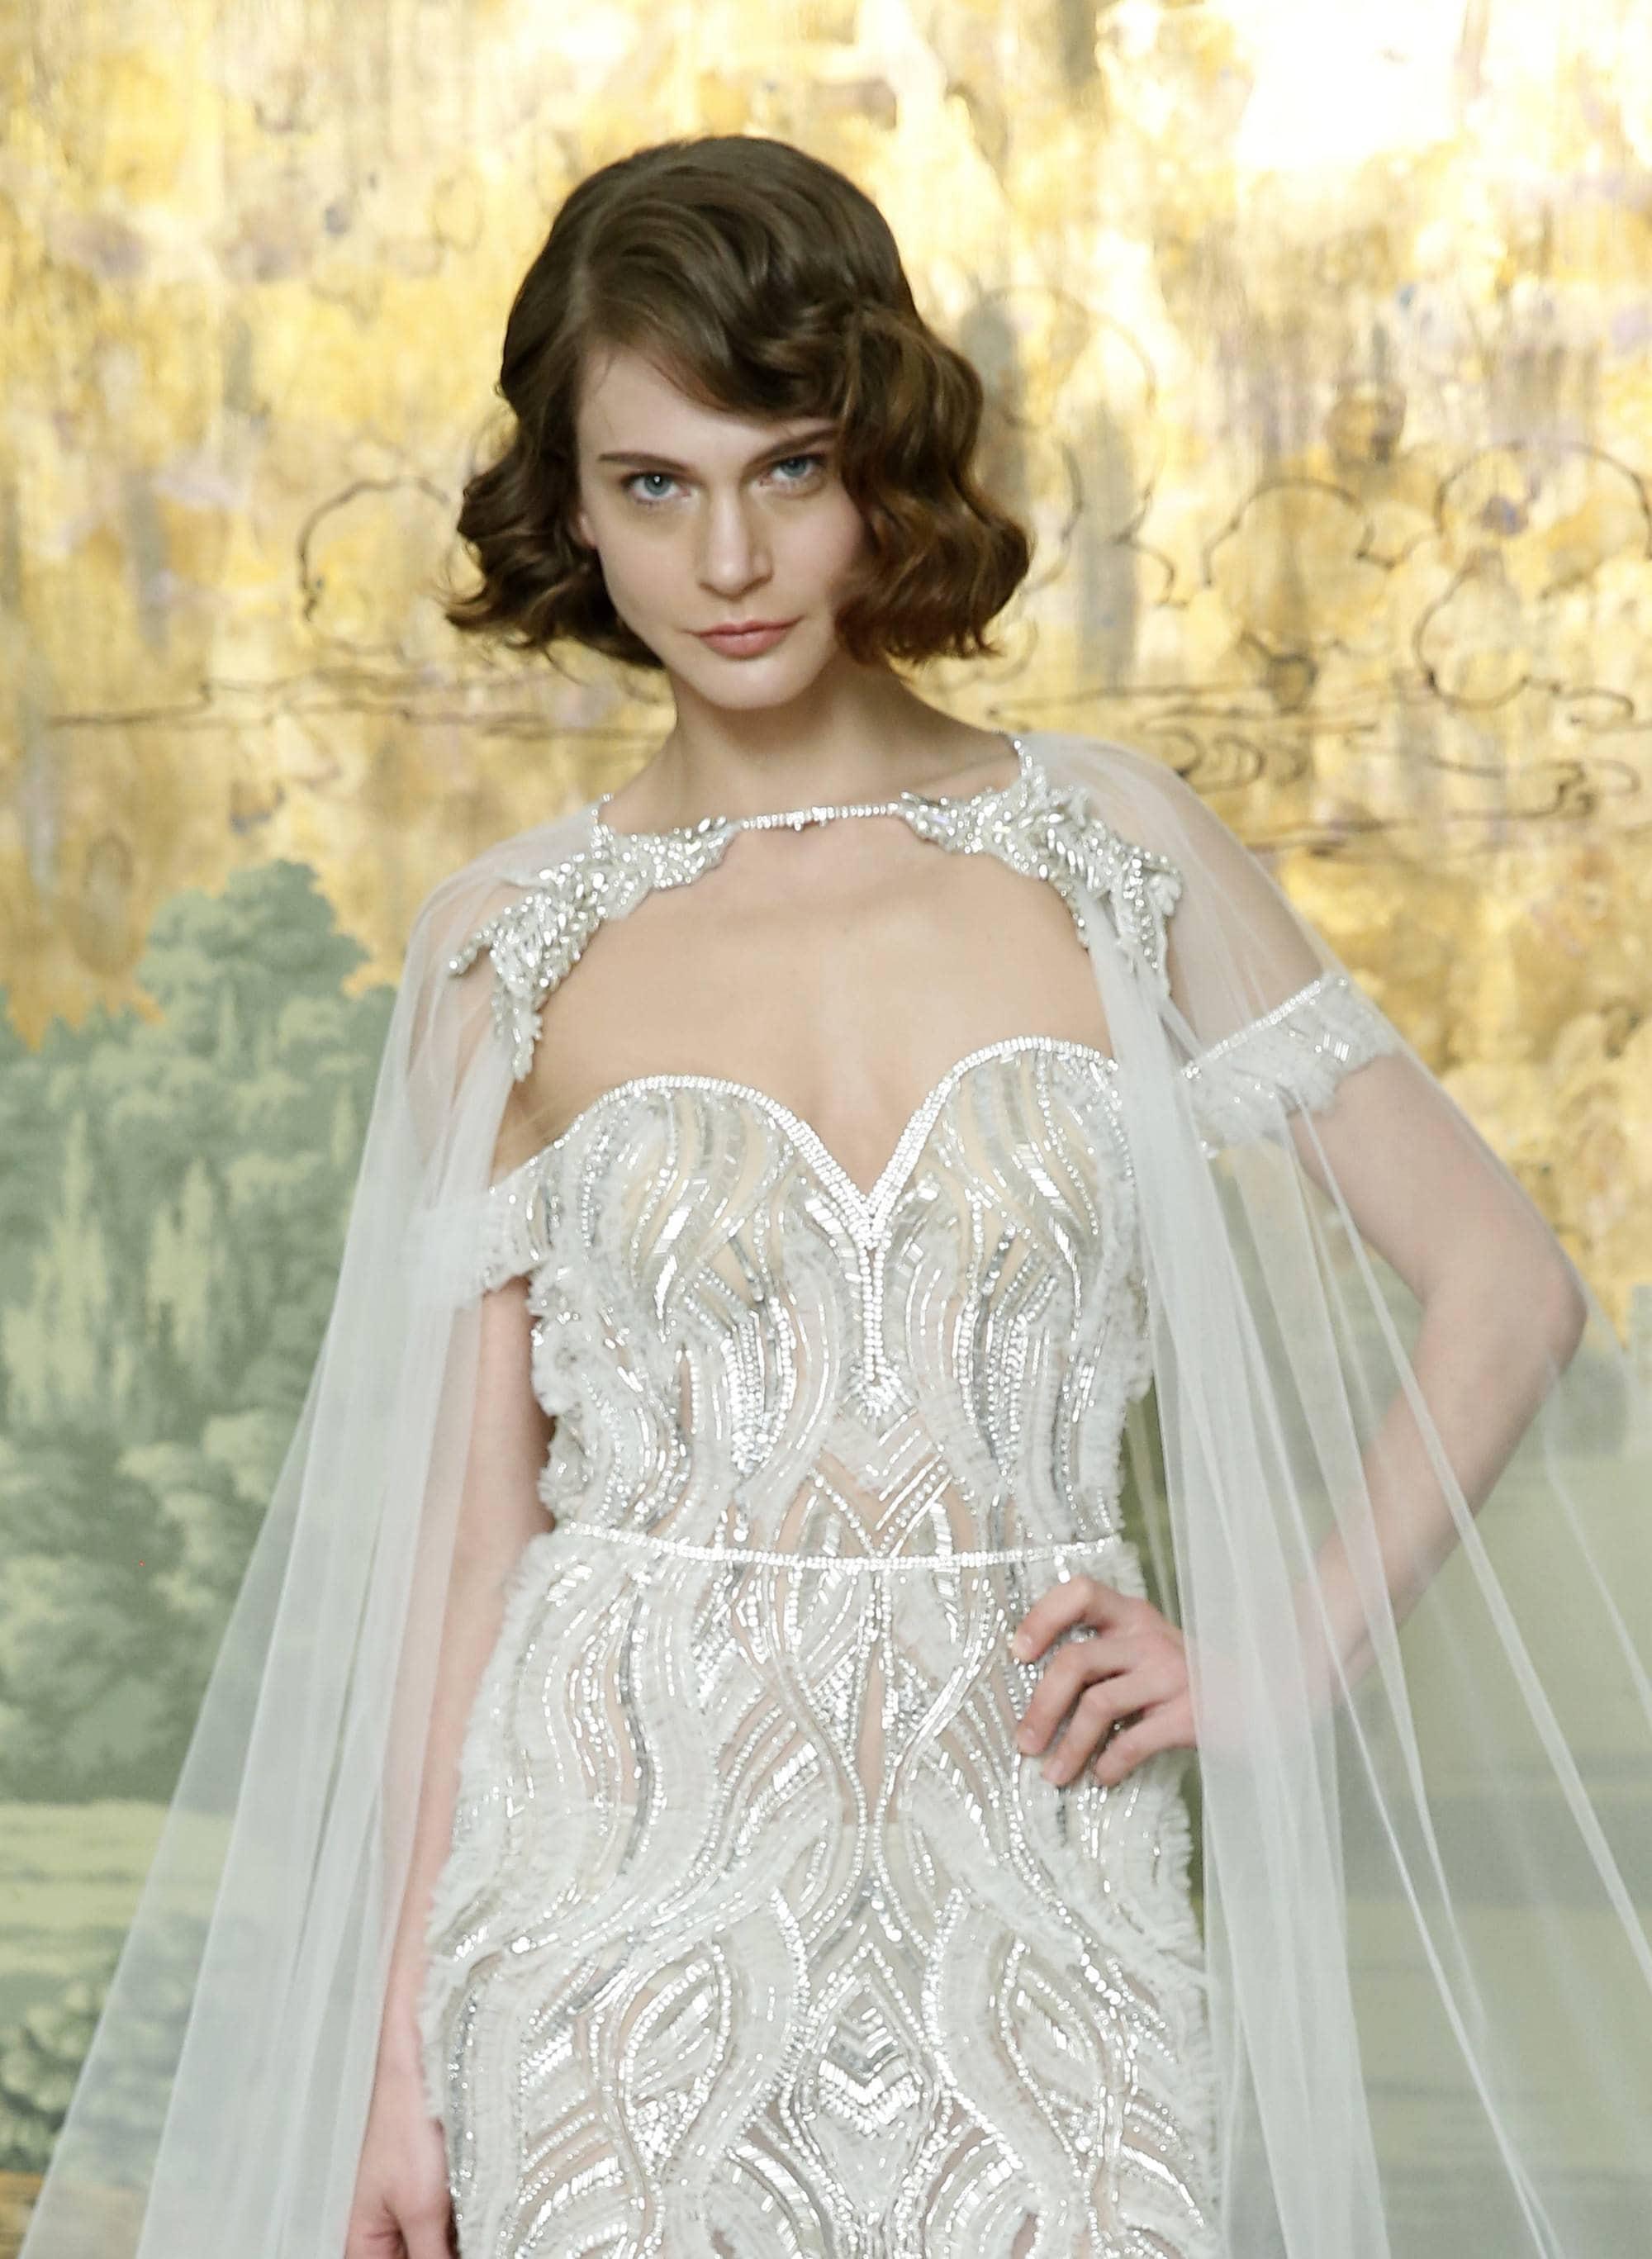 Curly wedding hair: Brunette bridal model with bob length '20s inspired finger waves